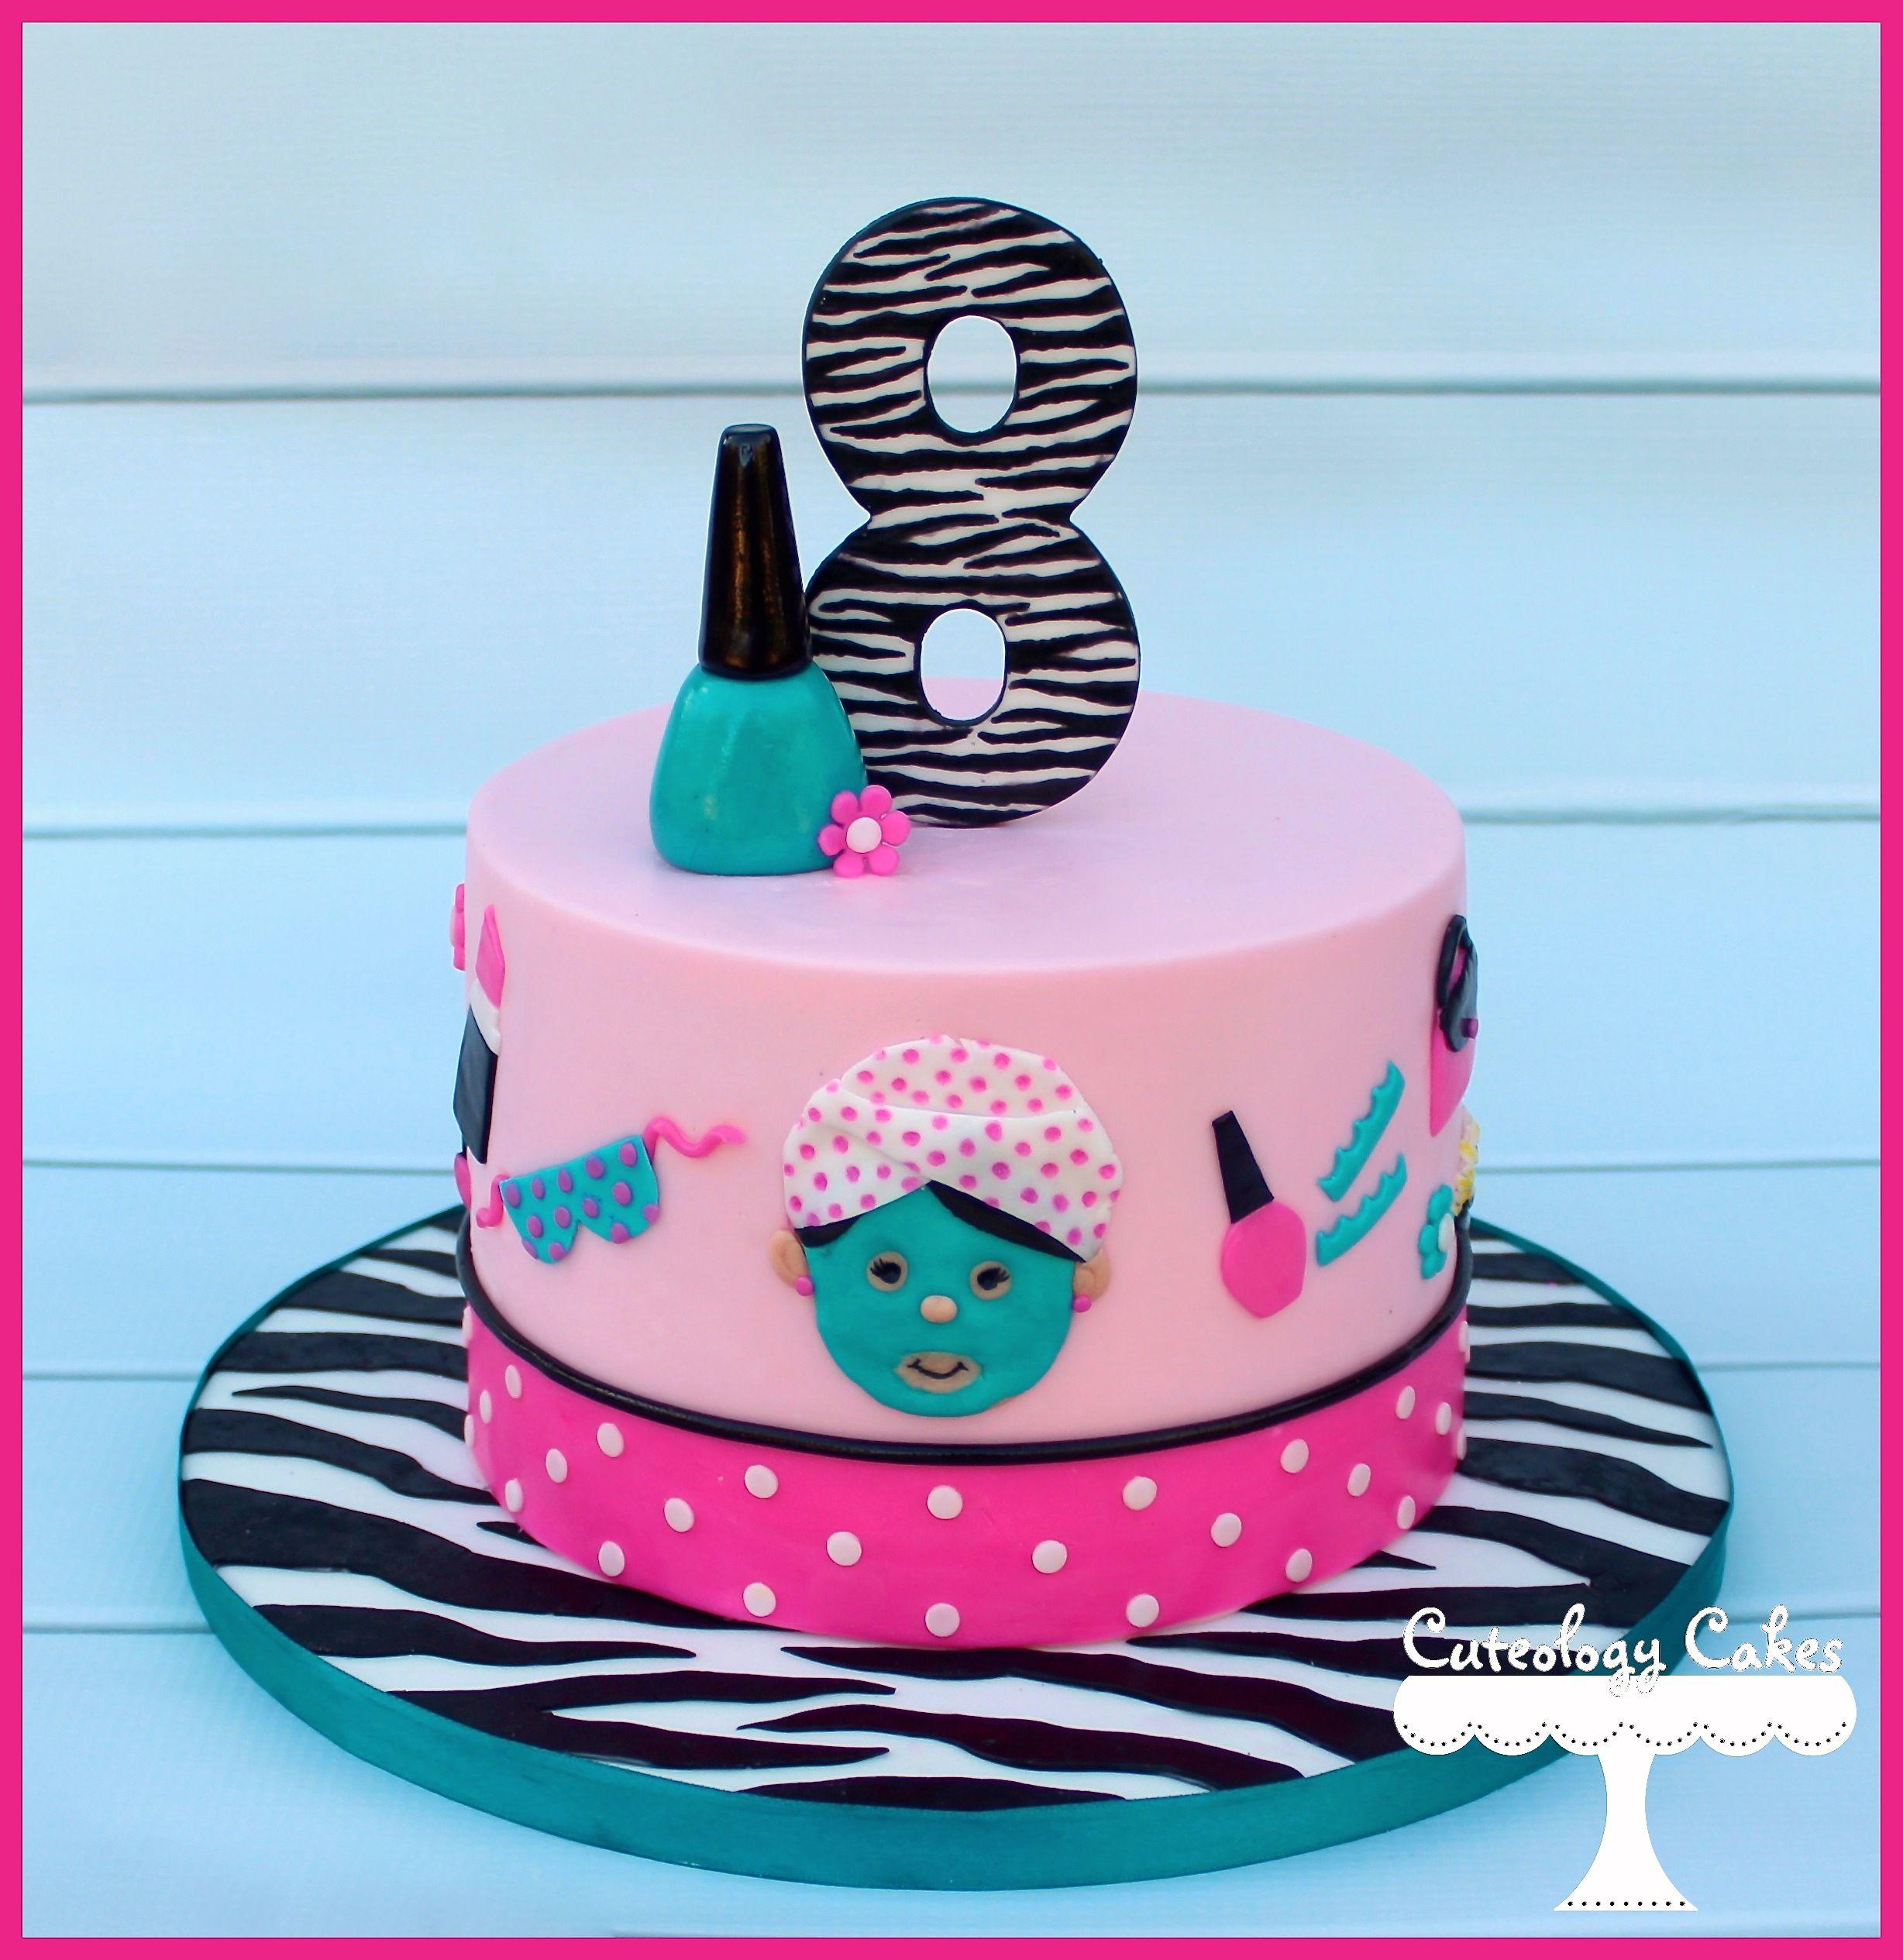 Spa Themed Birthday Cake Wwwfacebookcomilovecuteologycakes - Spa birthday party cake